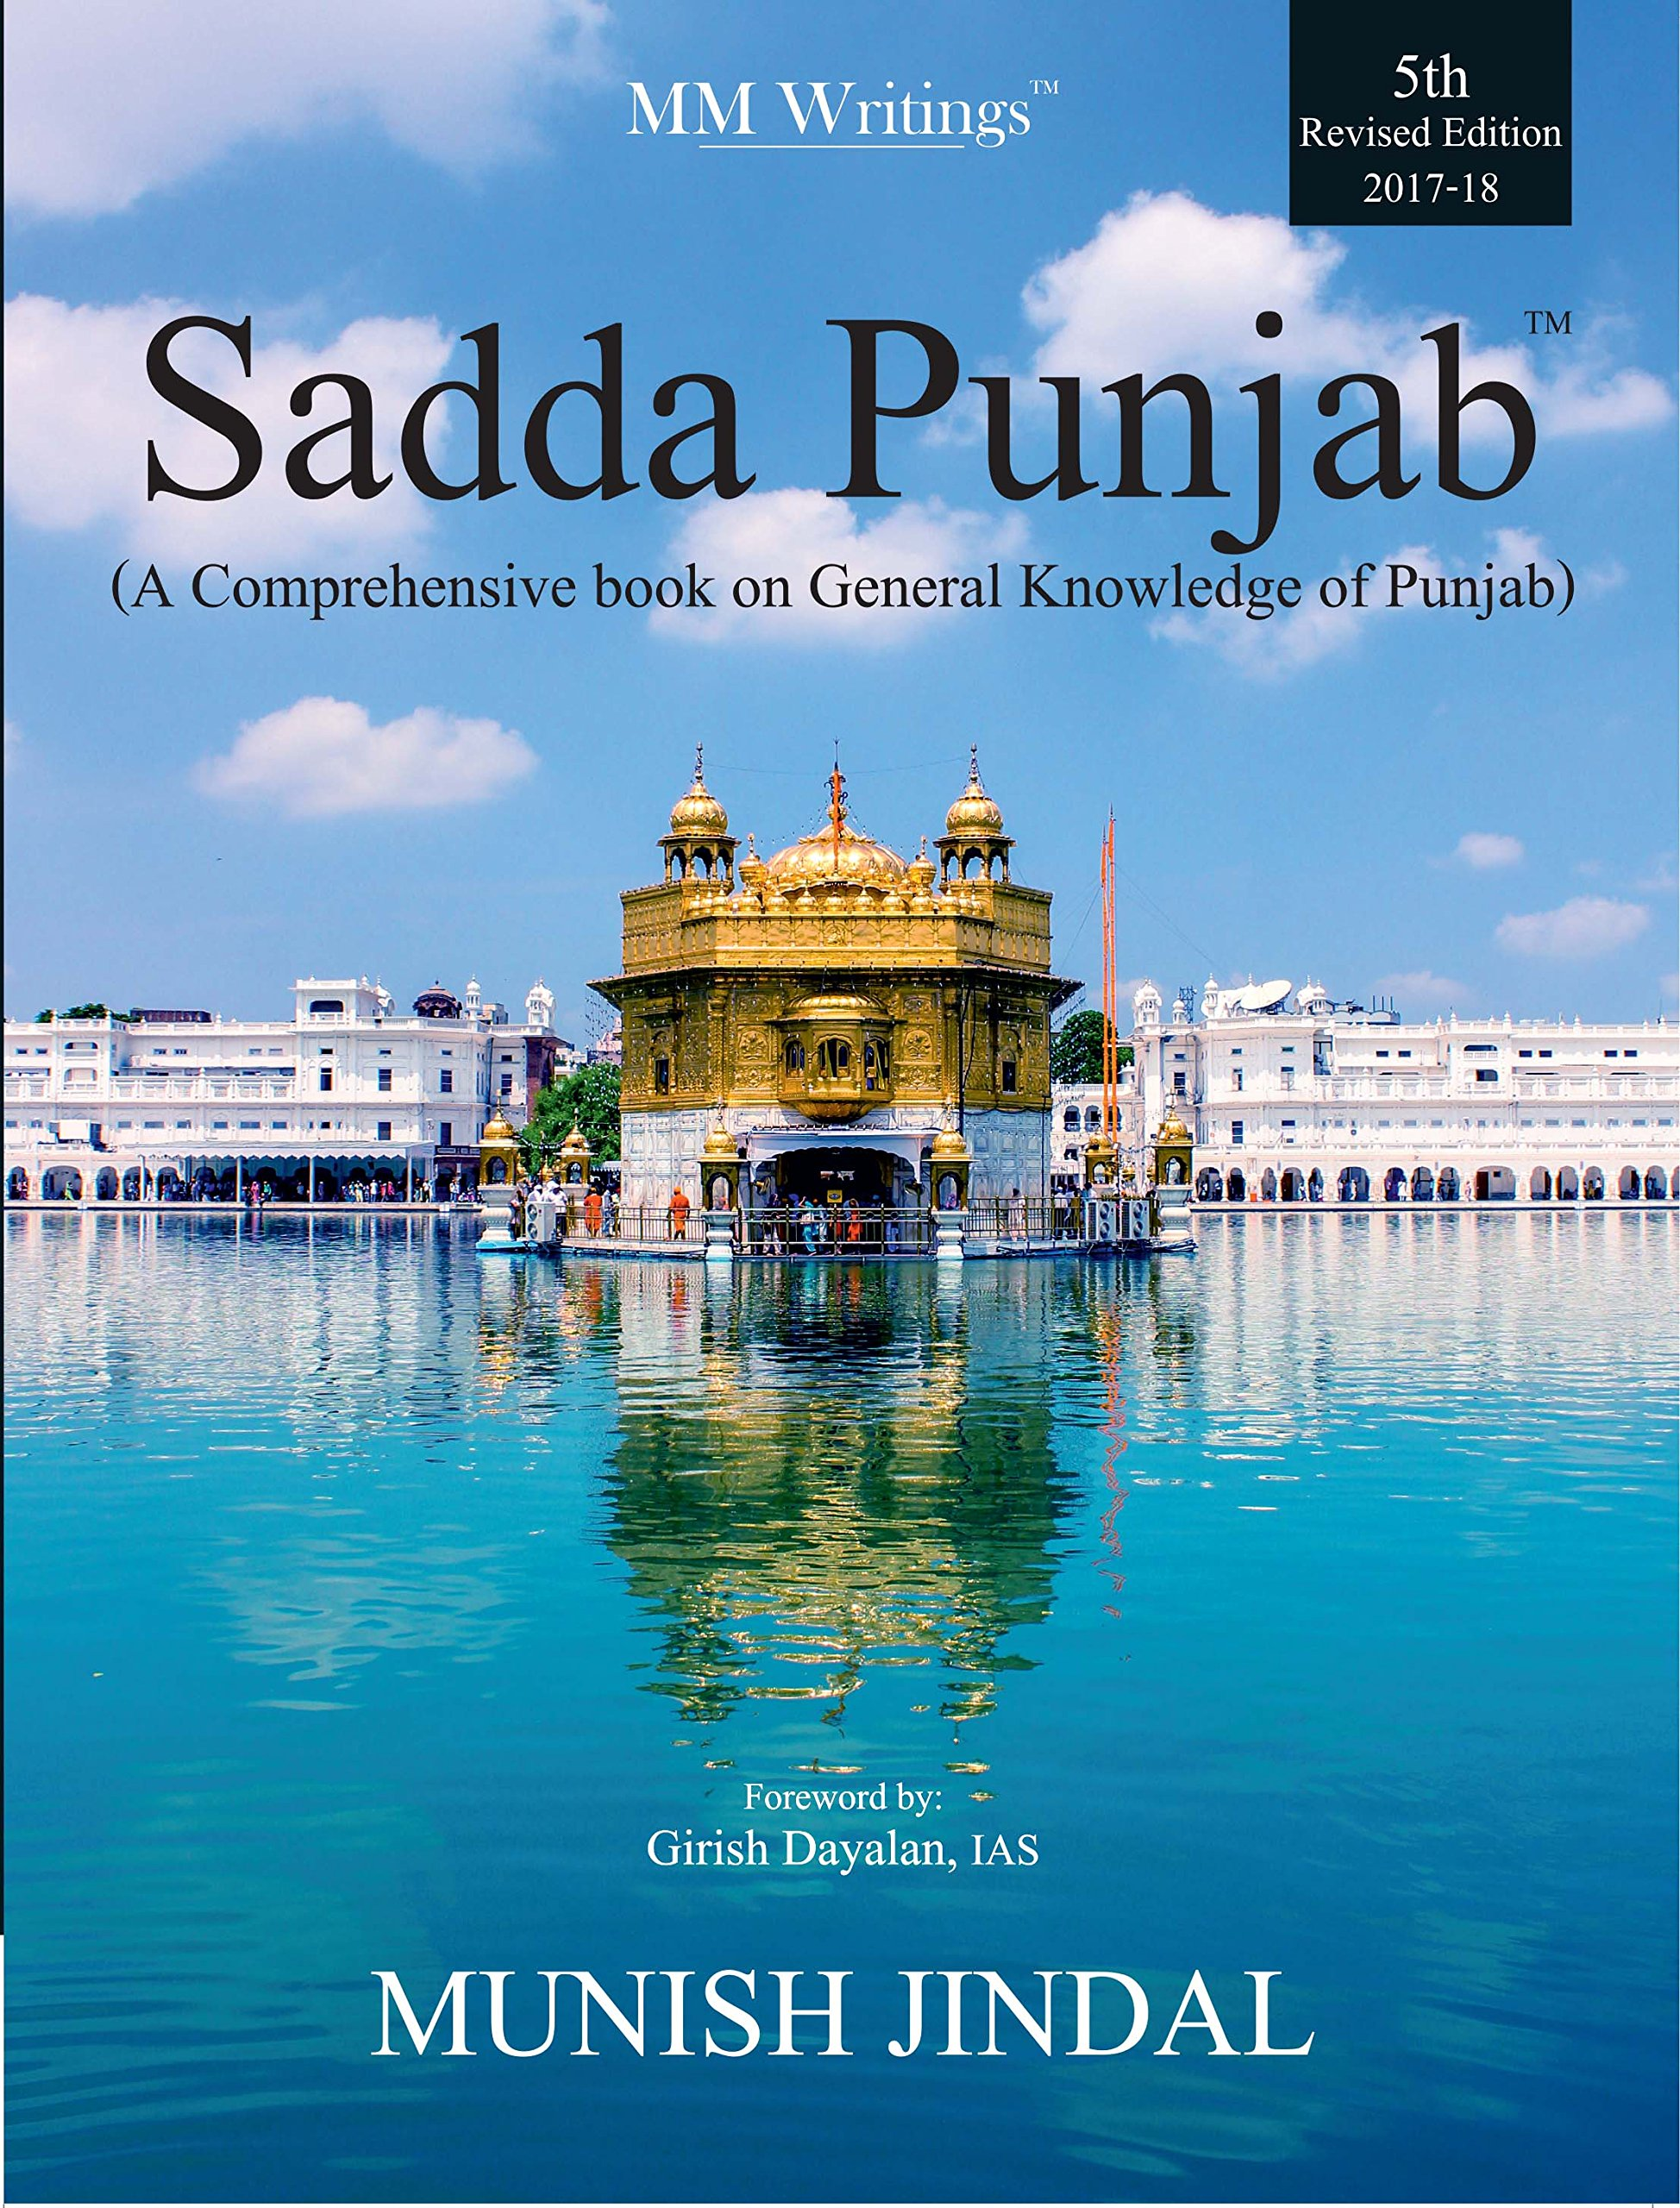 Sada Punjab Book Pdf